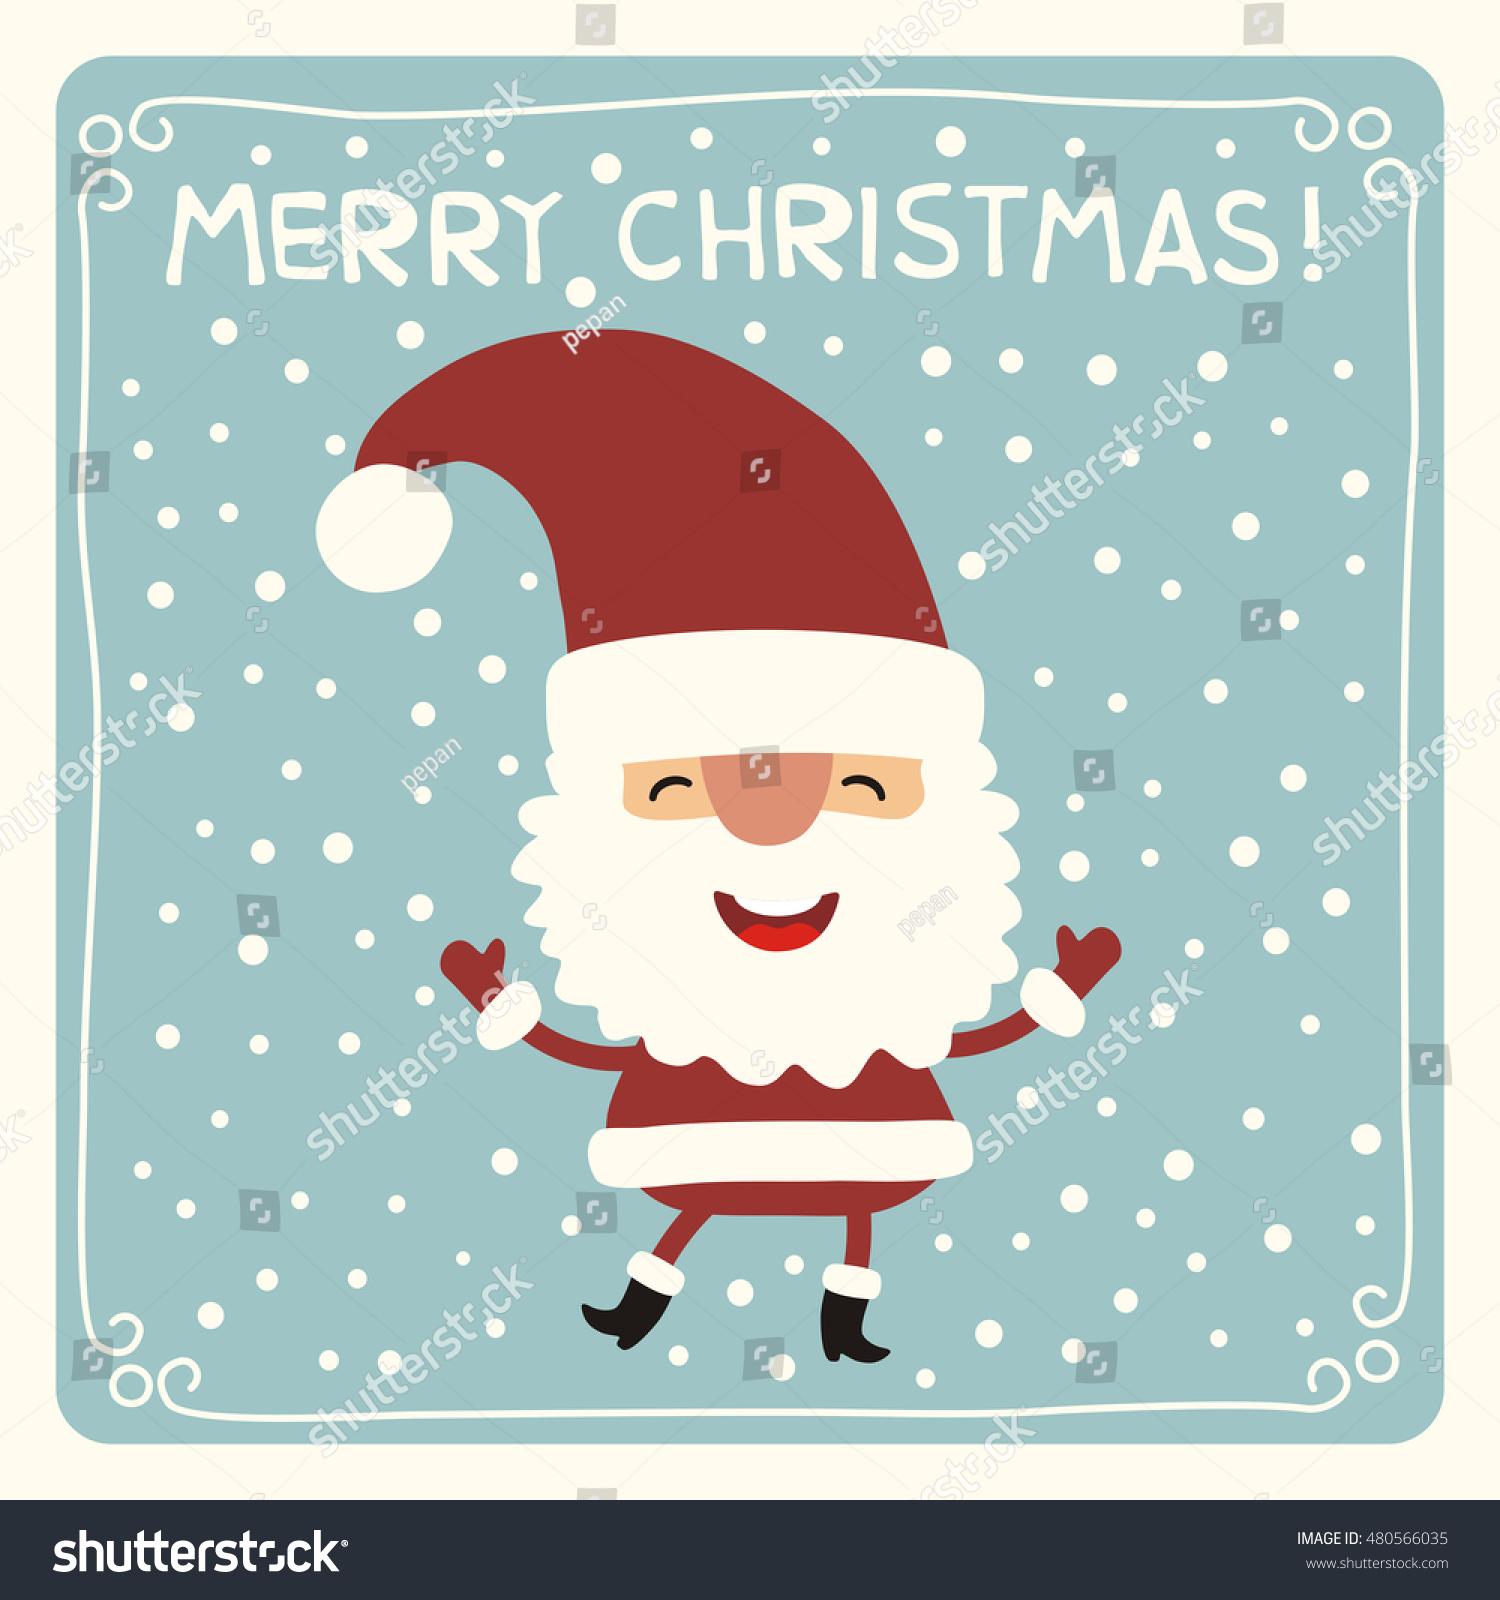 Merry christmas funny santa claus stock vector